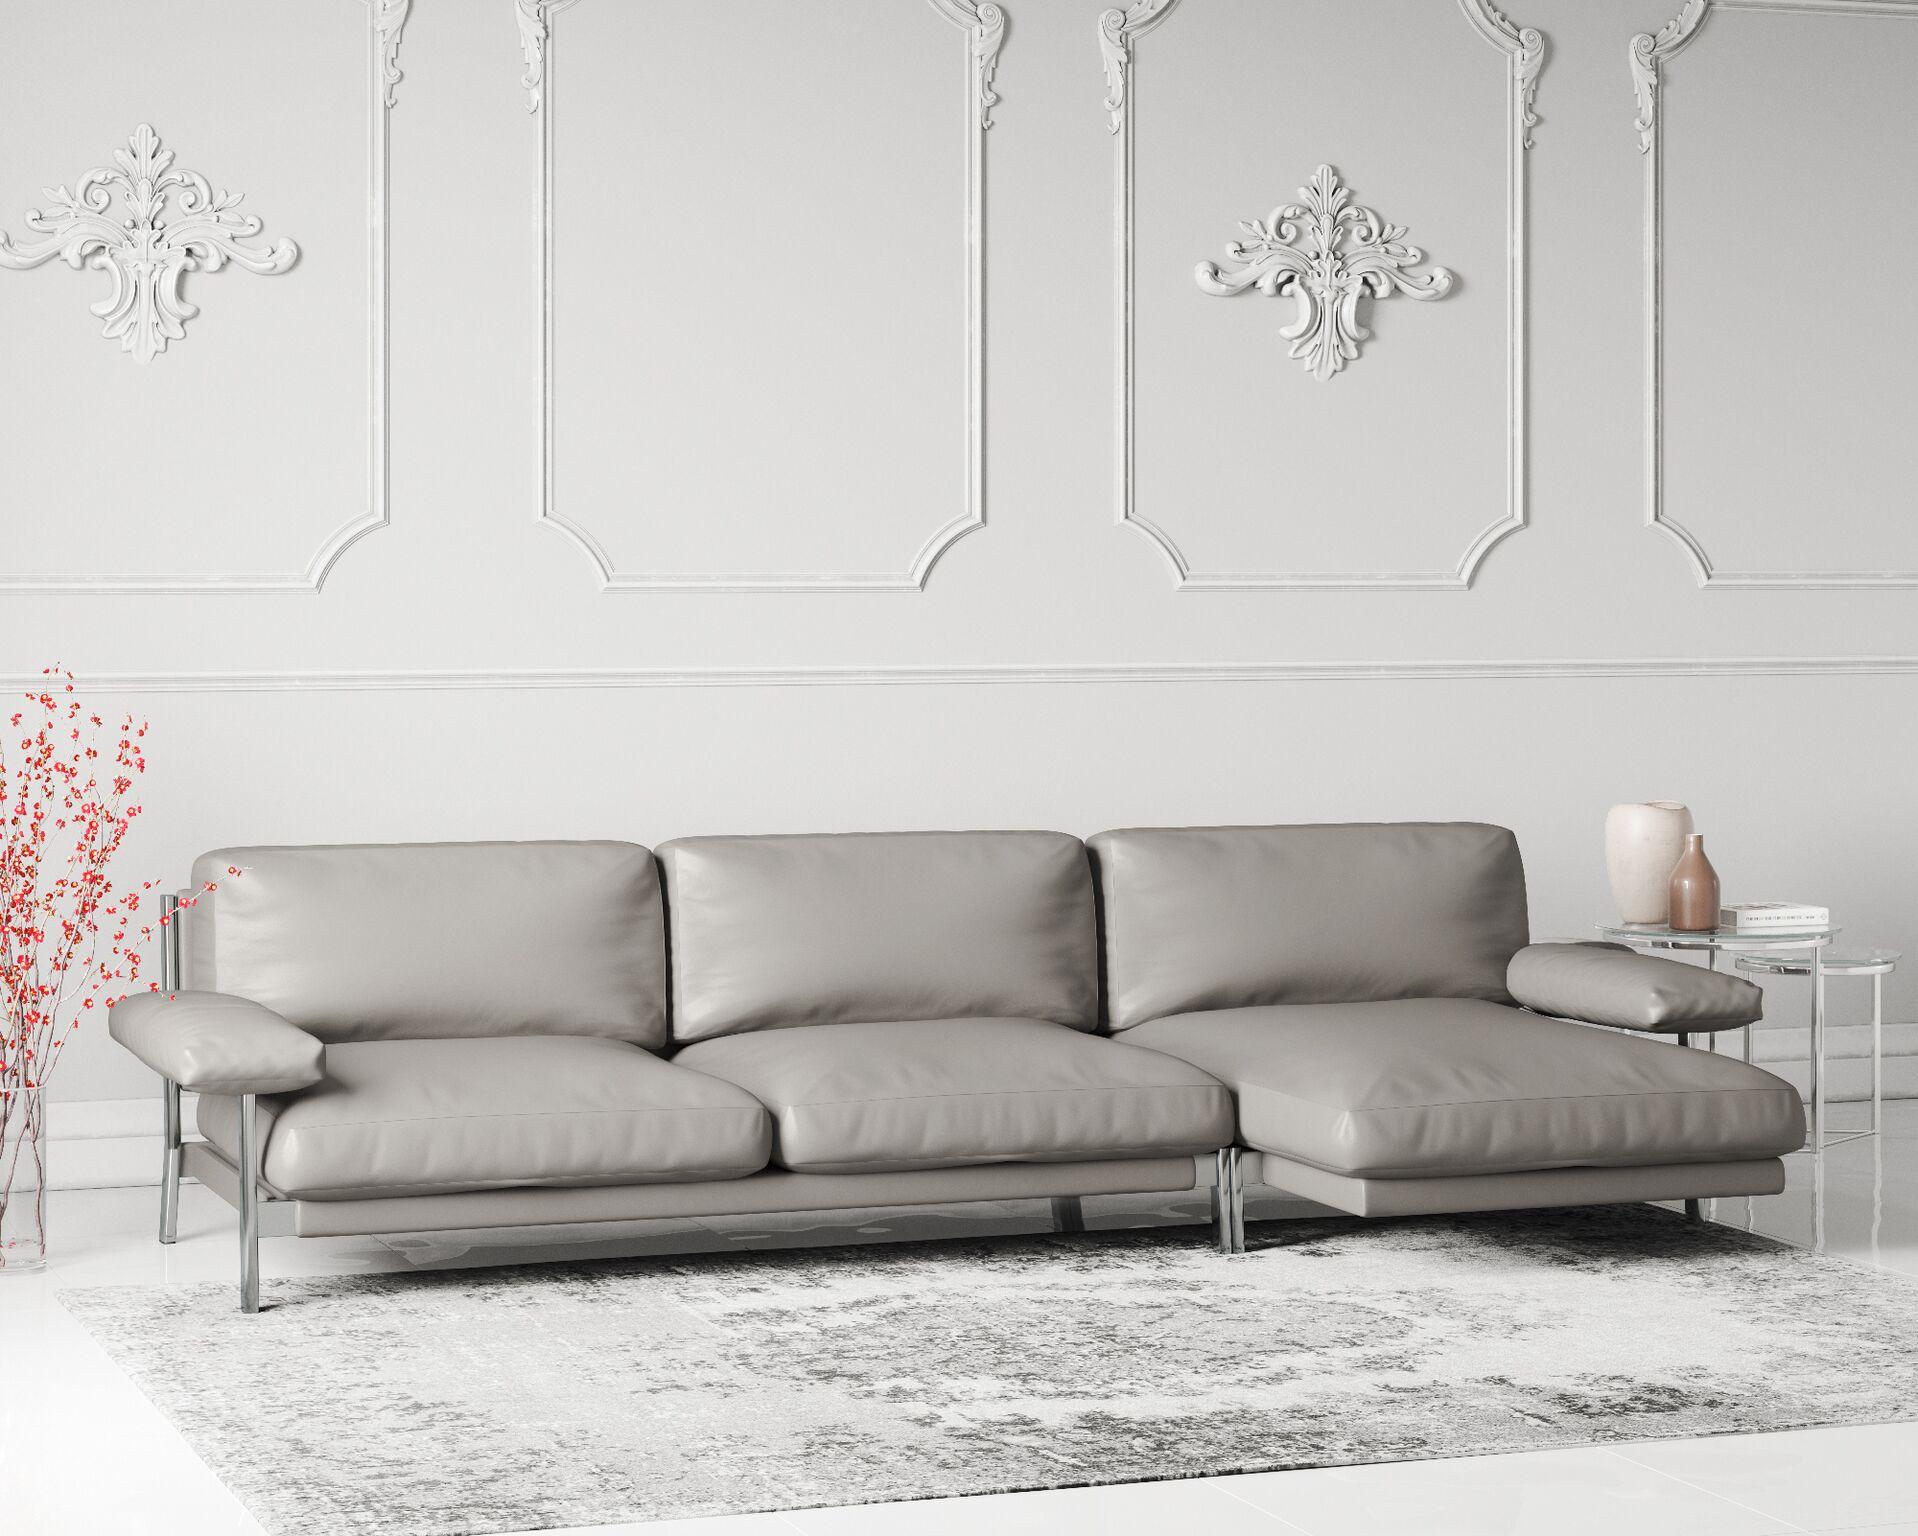 Buy Loafer Leather Corner Sofa Online in London, UK ...